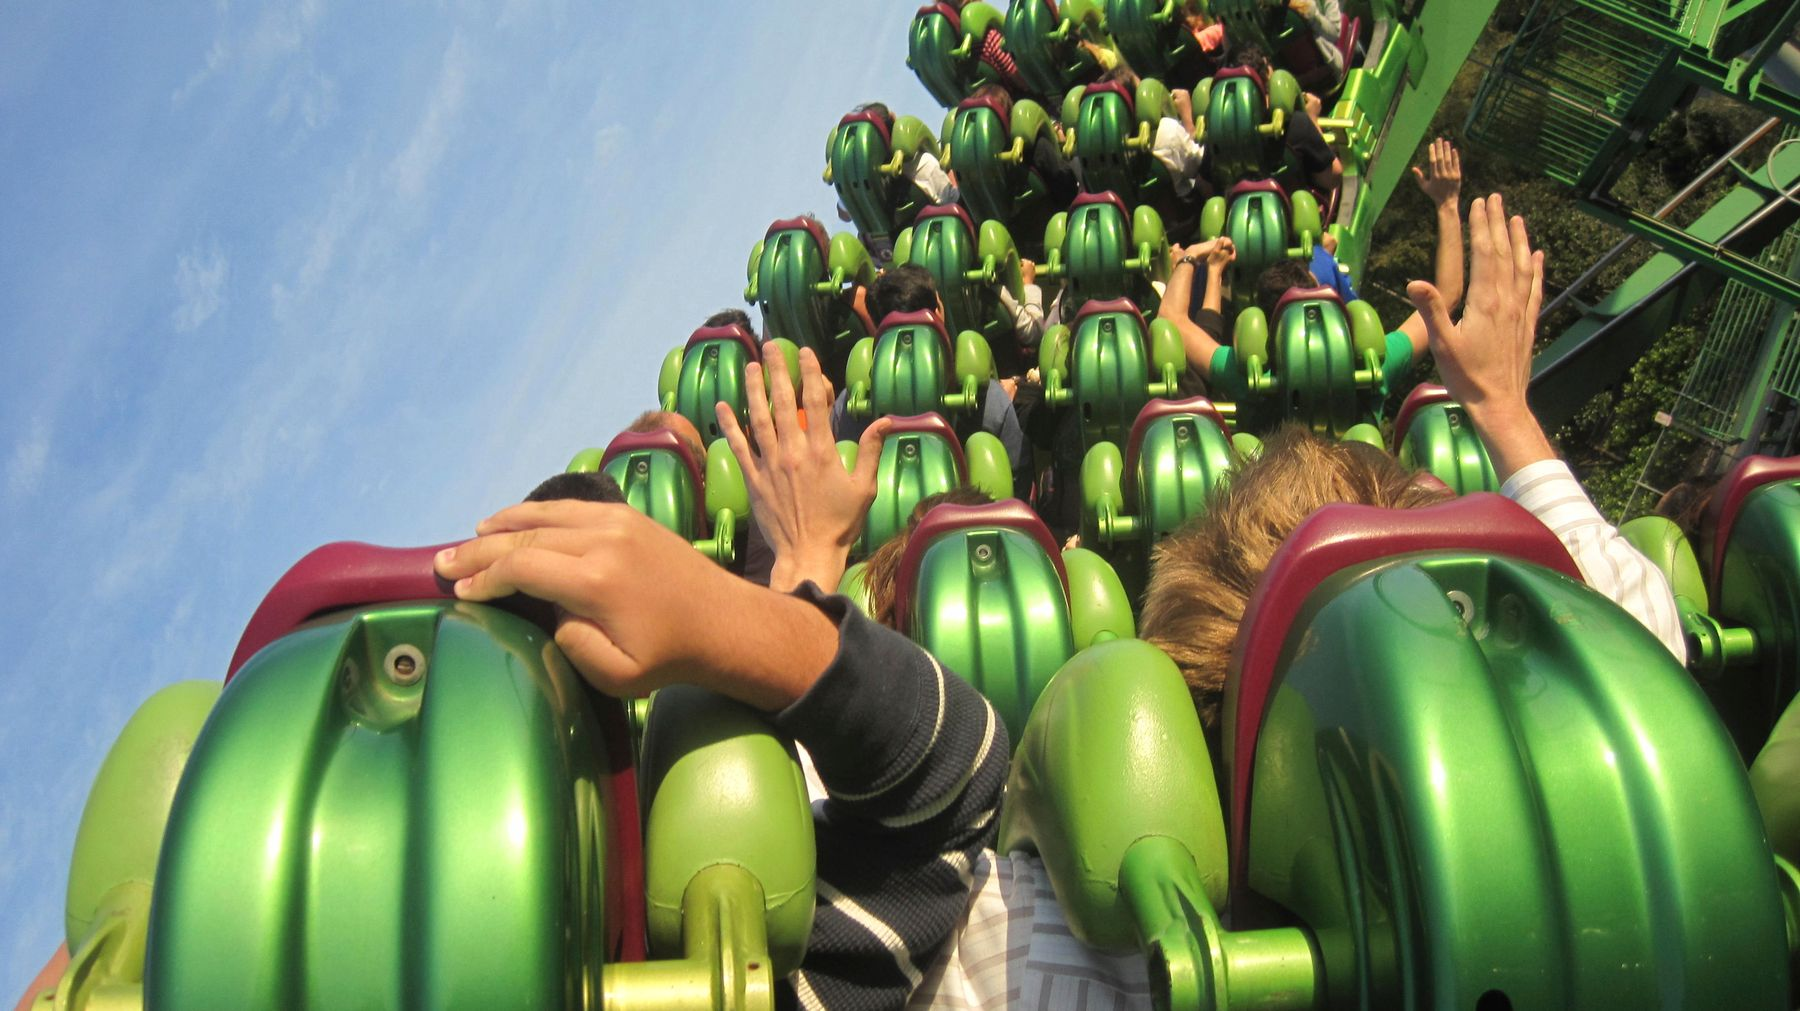 Cedar Point rollercoaster